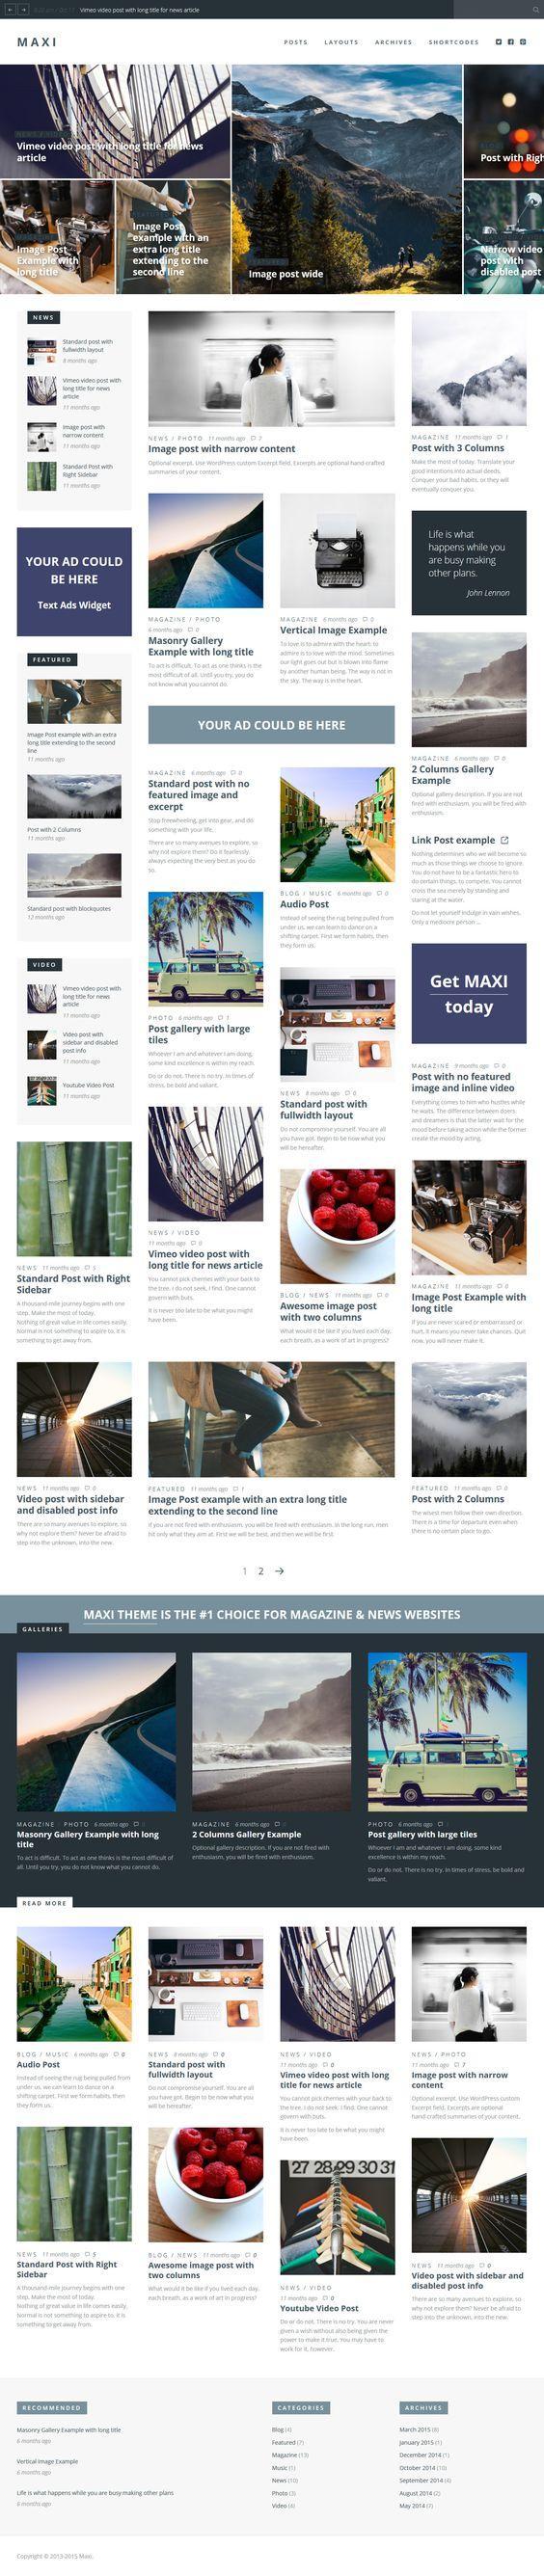 Maxi - News & Magazine Wordpress Theme #website Download: http://themeforest.net/item/maxi-news-magazine-theme/12645893?ref=ksioks